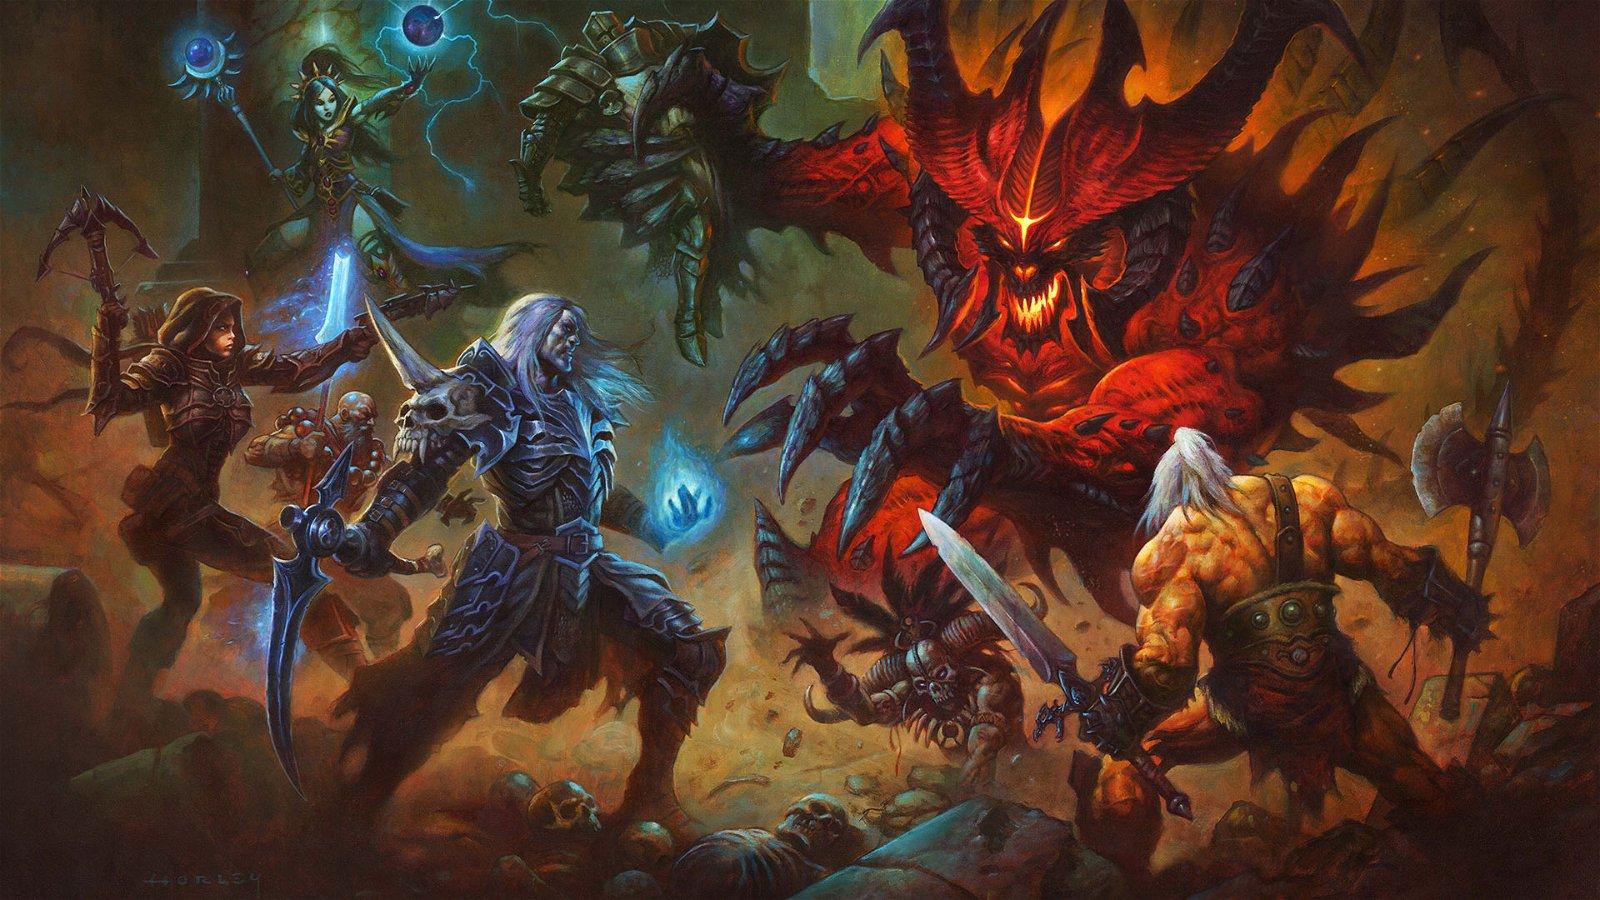 Diablo III: Rise of the Necromancer Review - Nostalgia Done